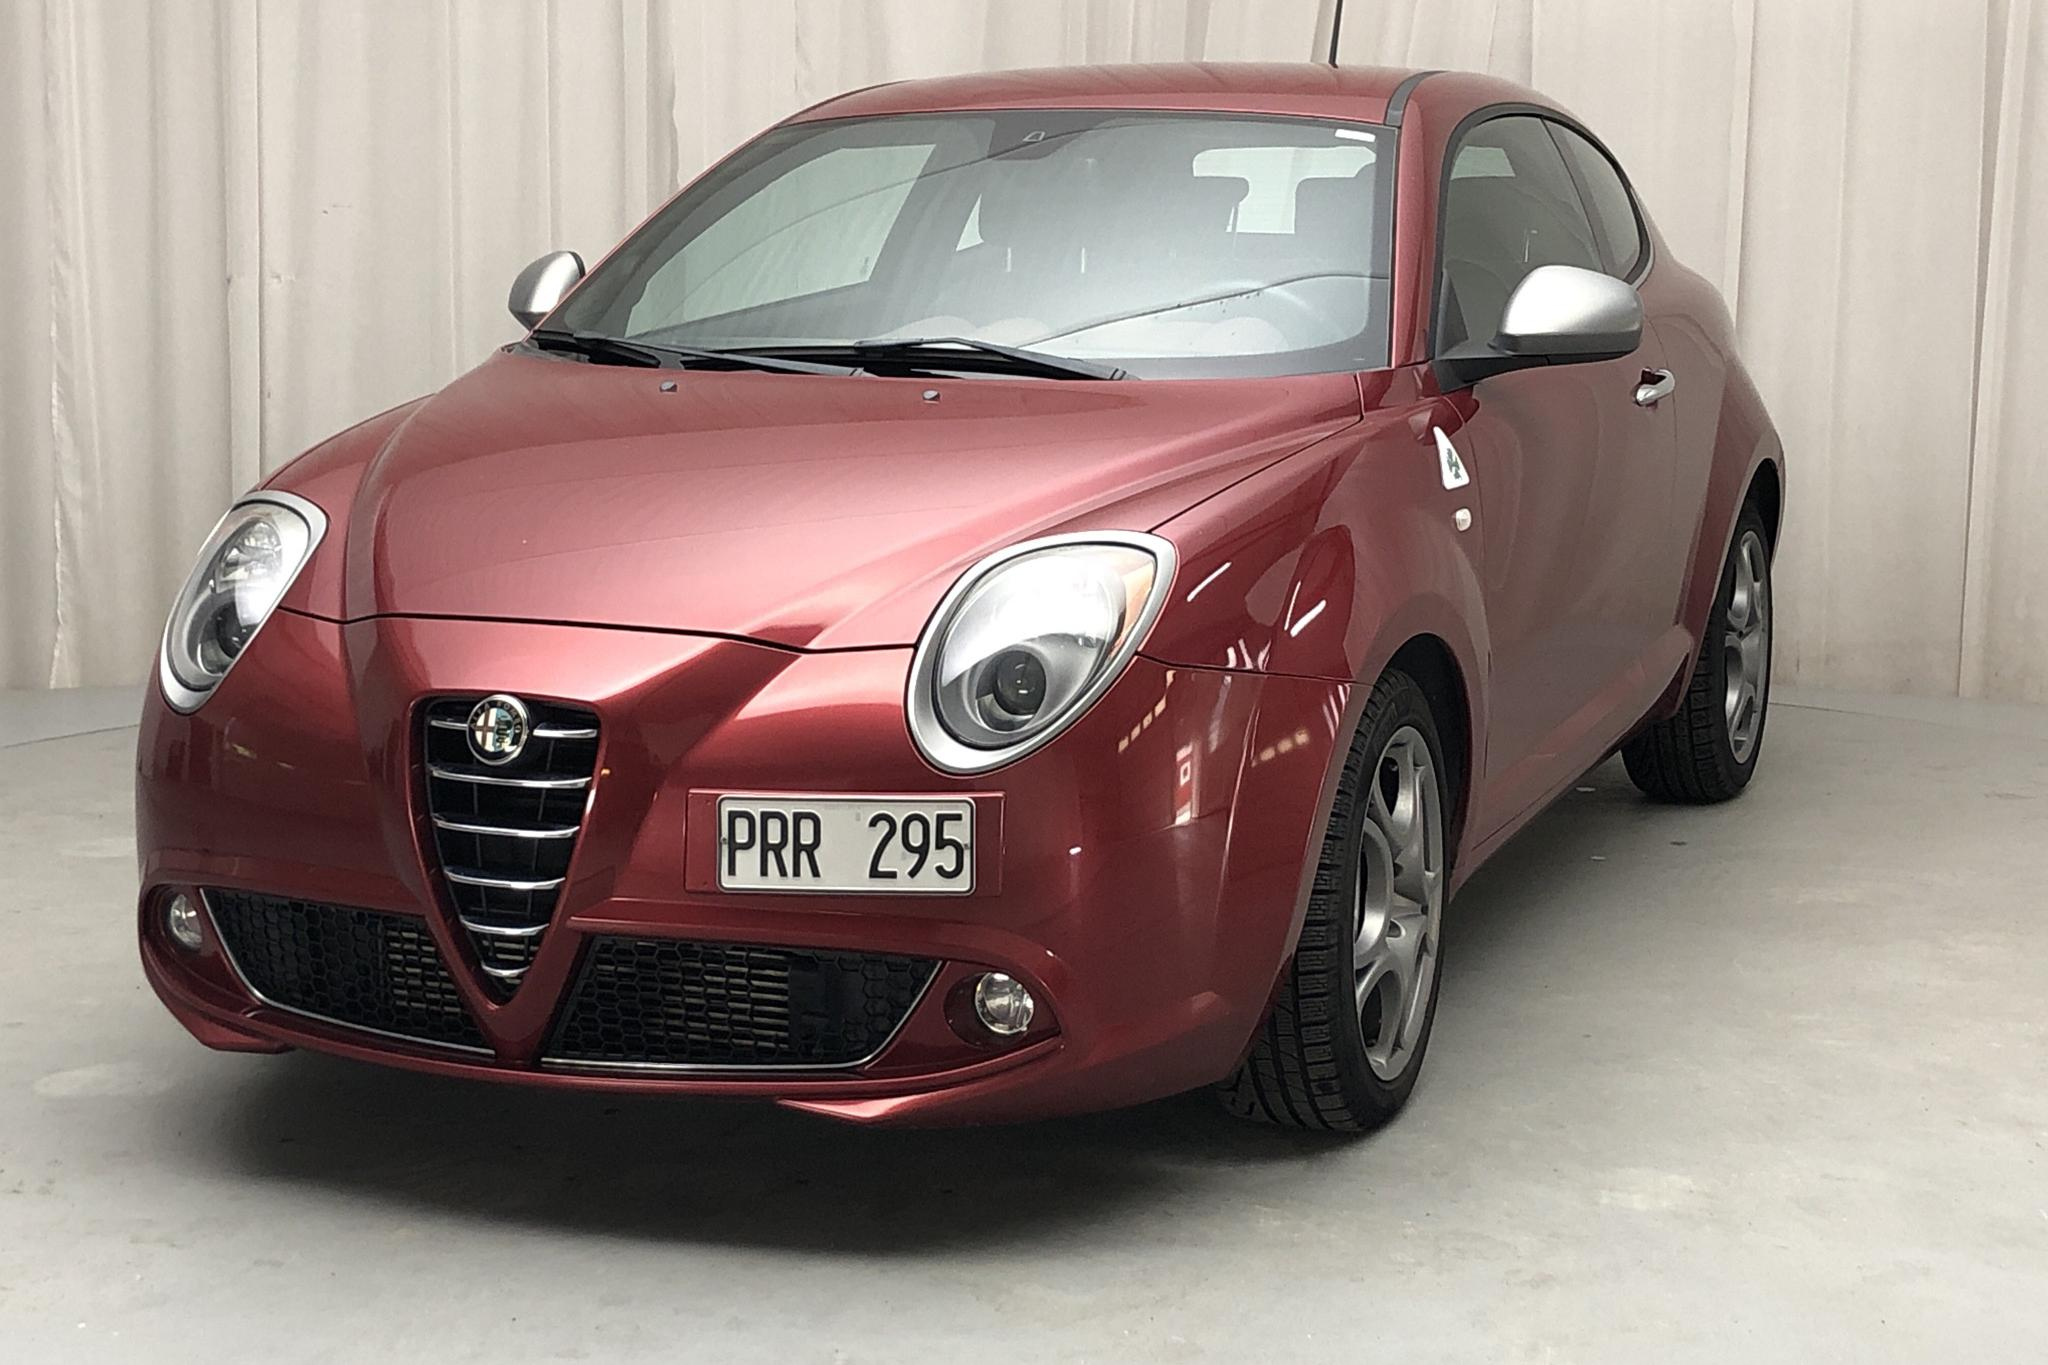 Alfa Romeo MiTo 1.4 MultiAir Turbo (170hk)